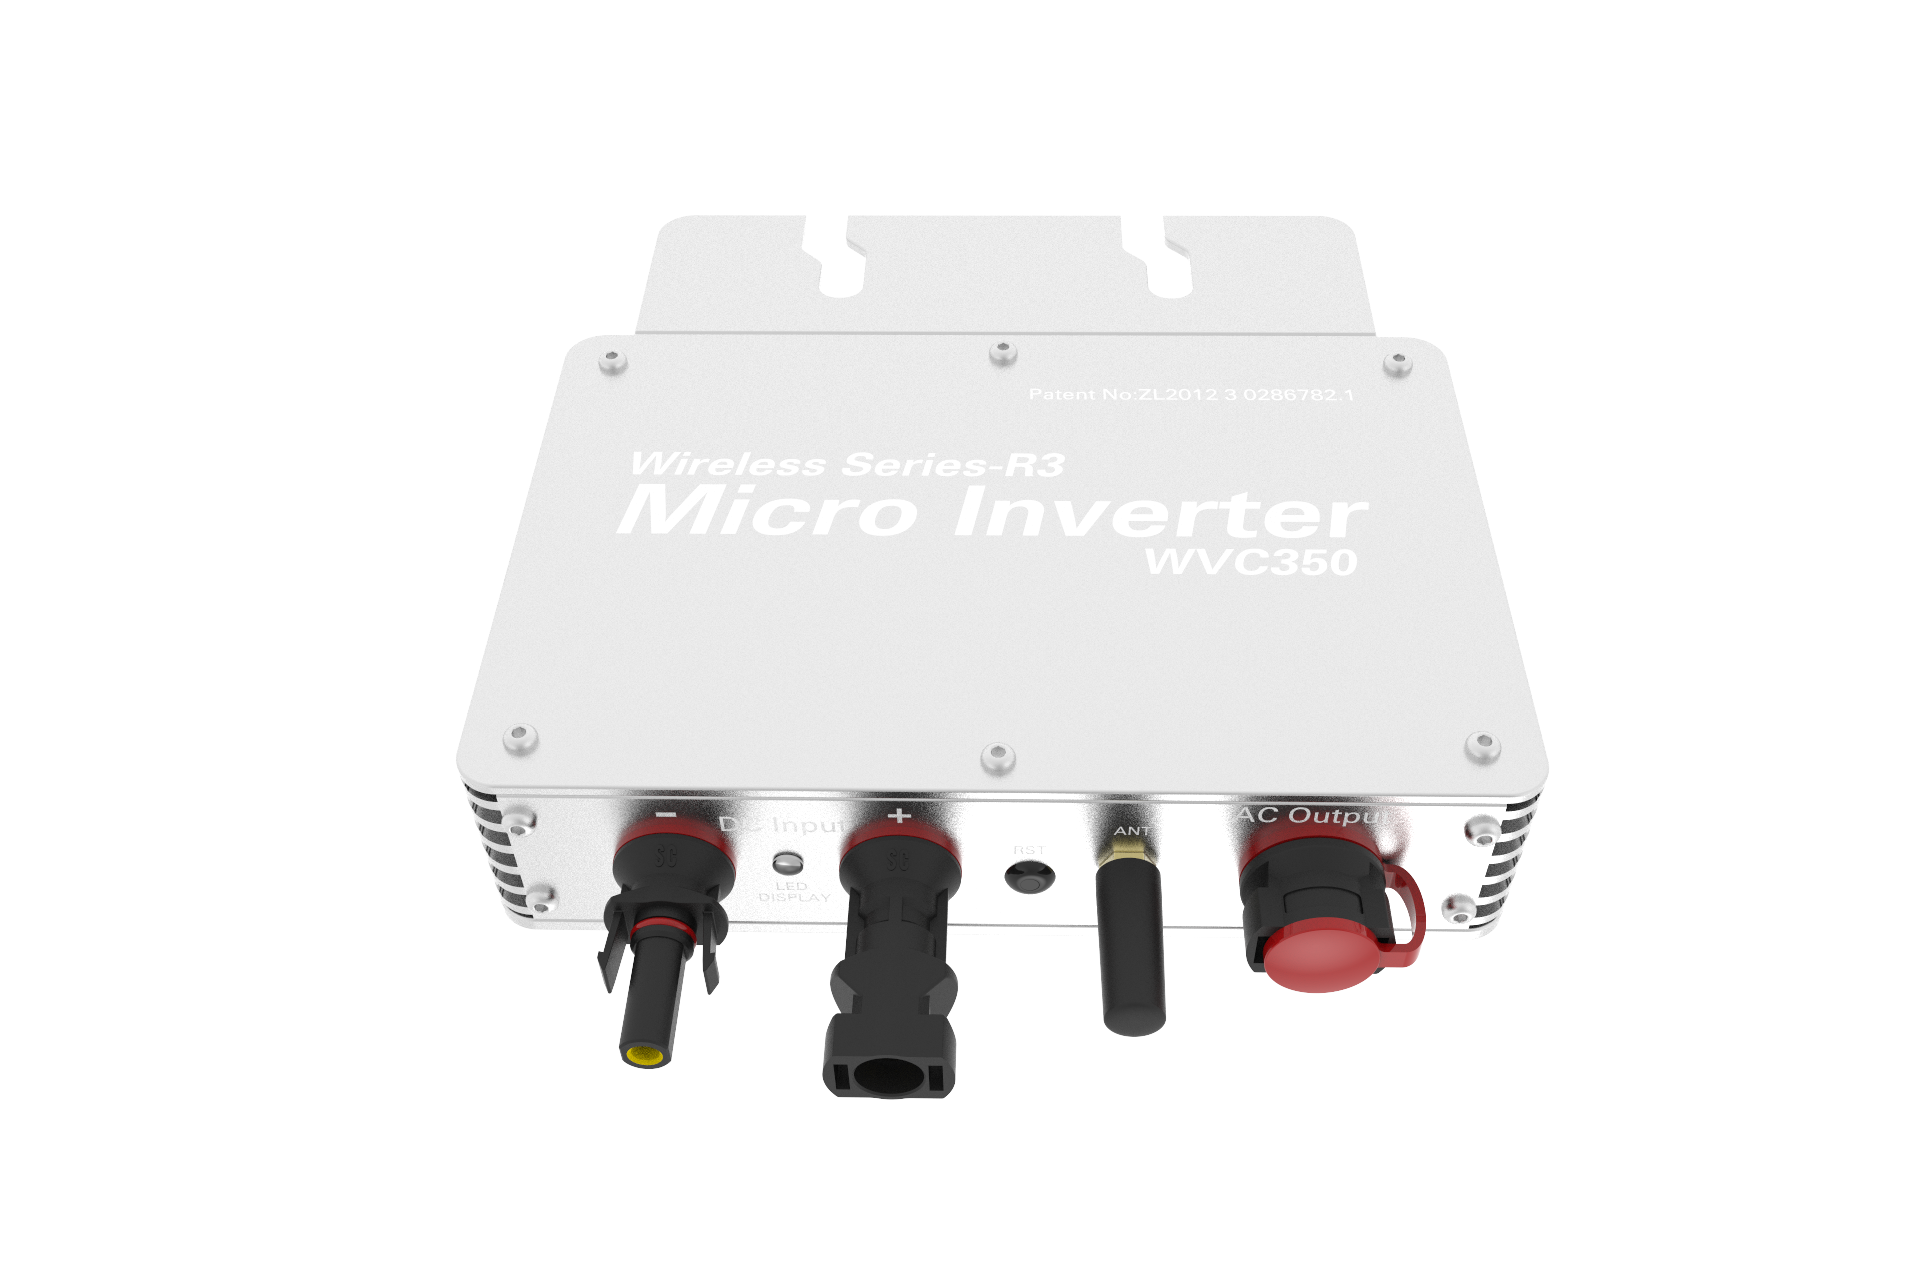 Mikroinwerter_ WVC350 (5)